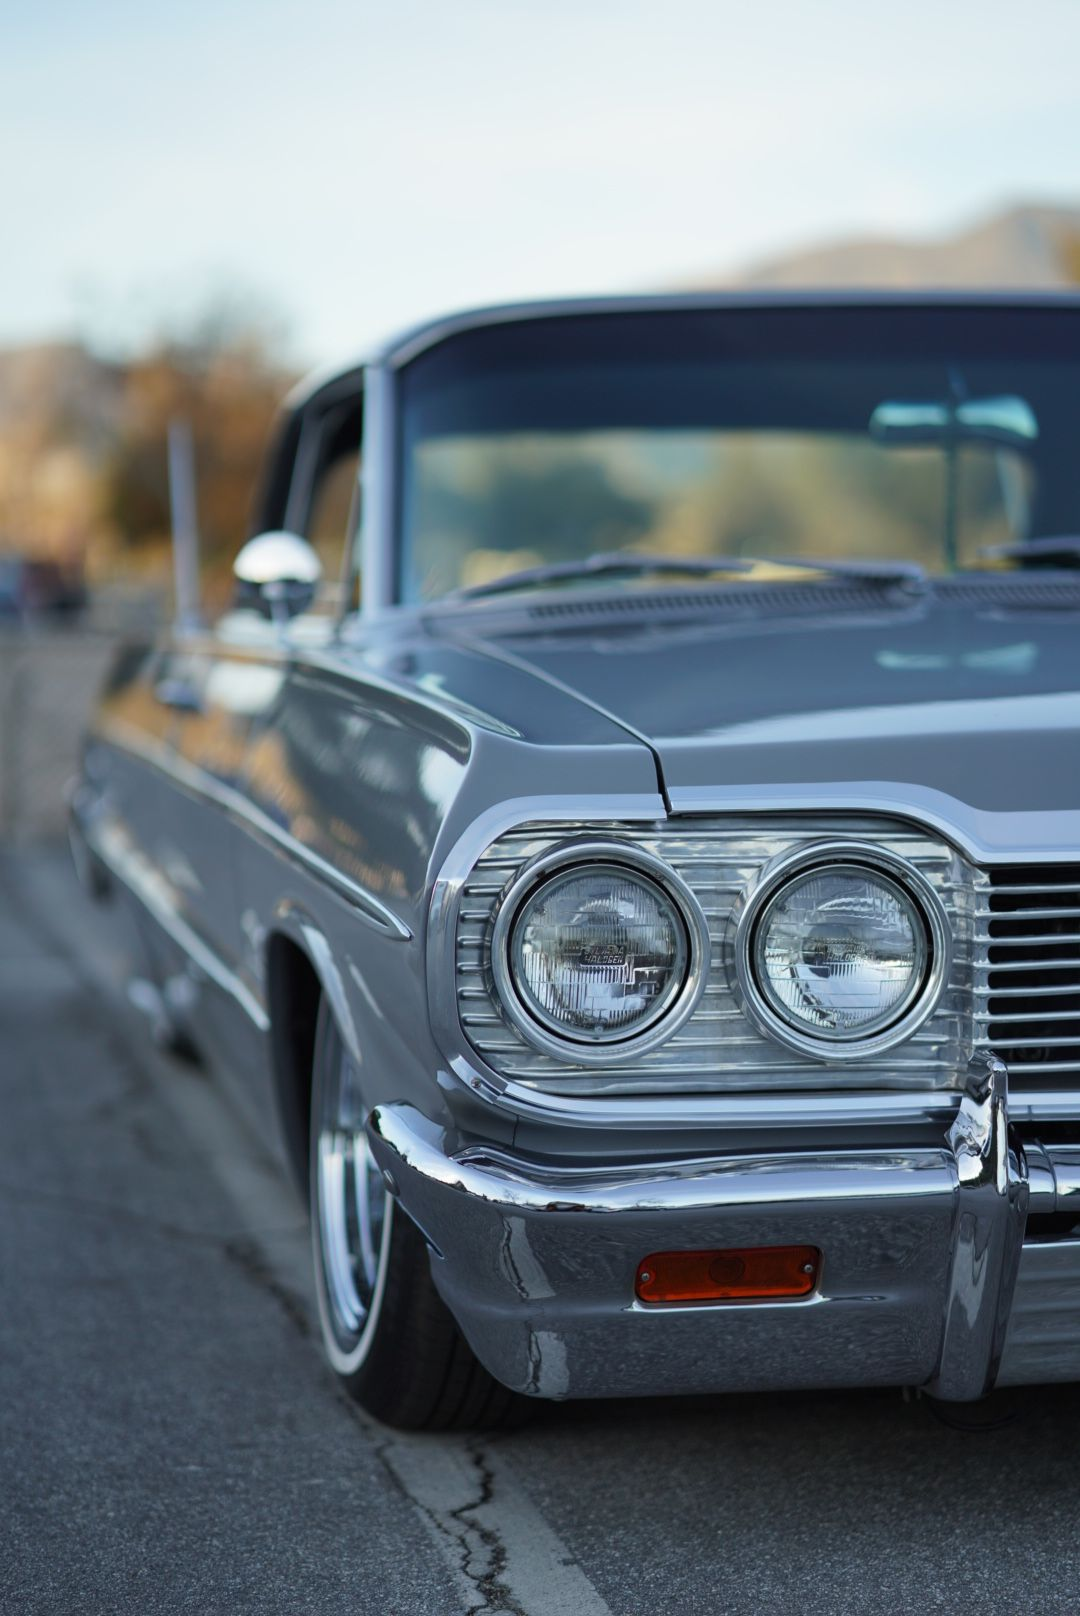 1964 Chevy Impala Impala Chevy Lowriders Lownslow Carshots